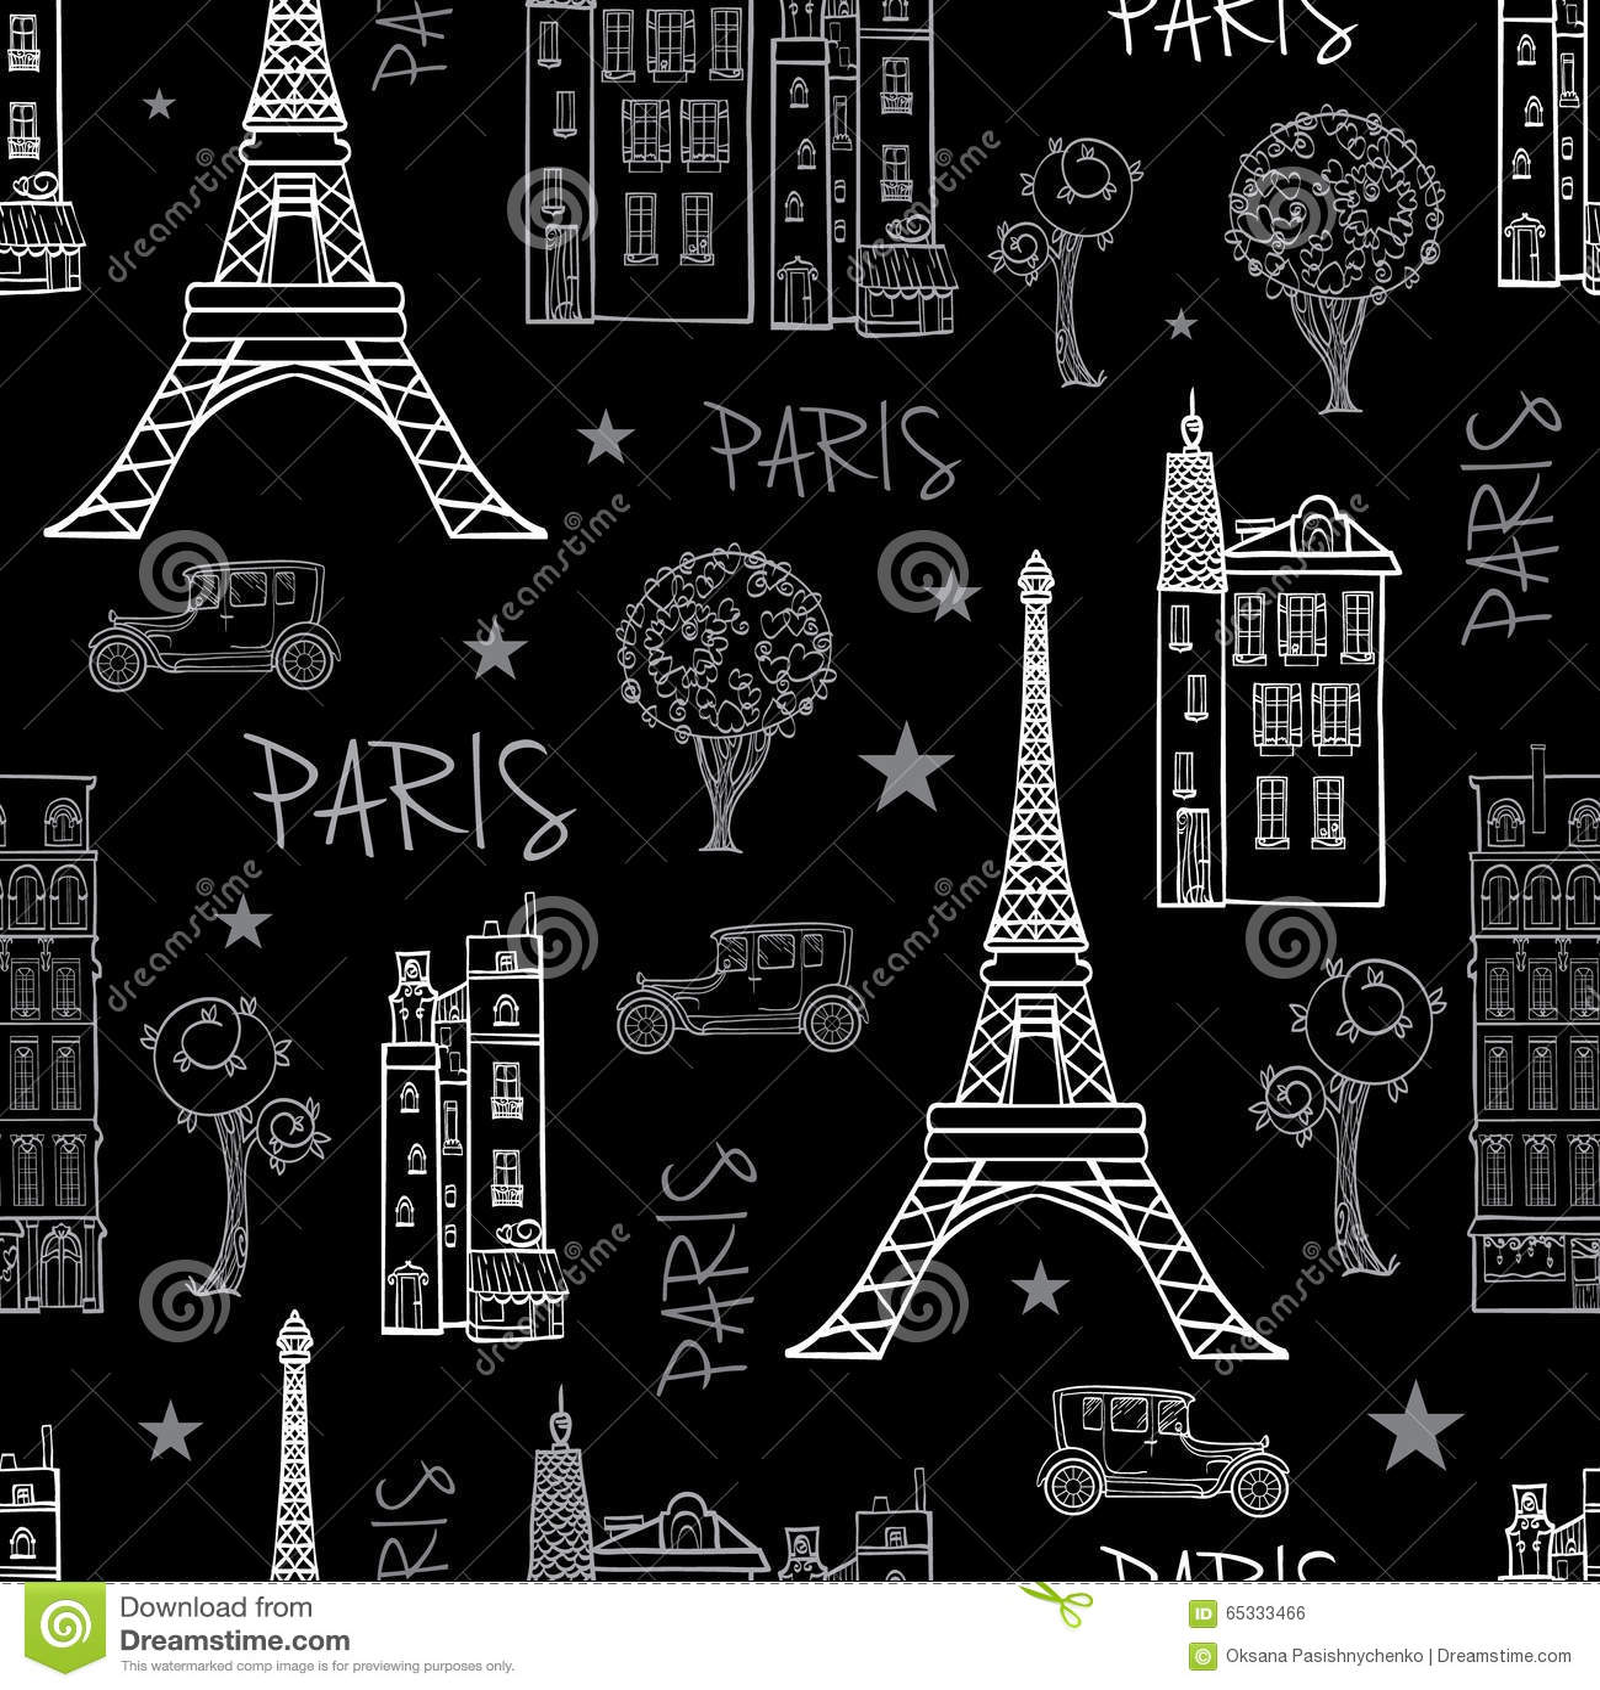 A Paris Apartment And A Paris Graphic: Vector Black White Paris Streets Travel Seamless Stock